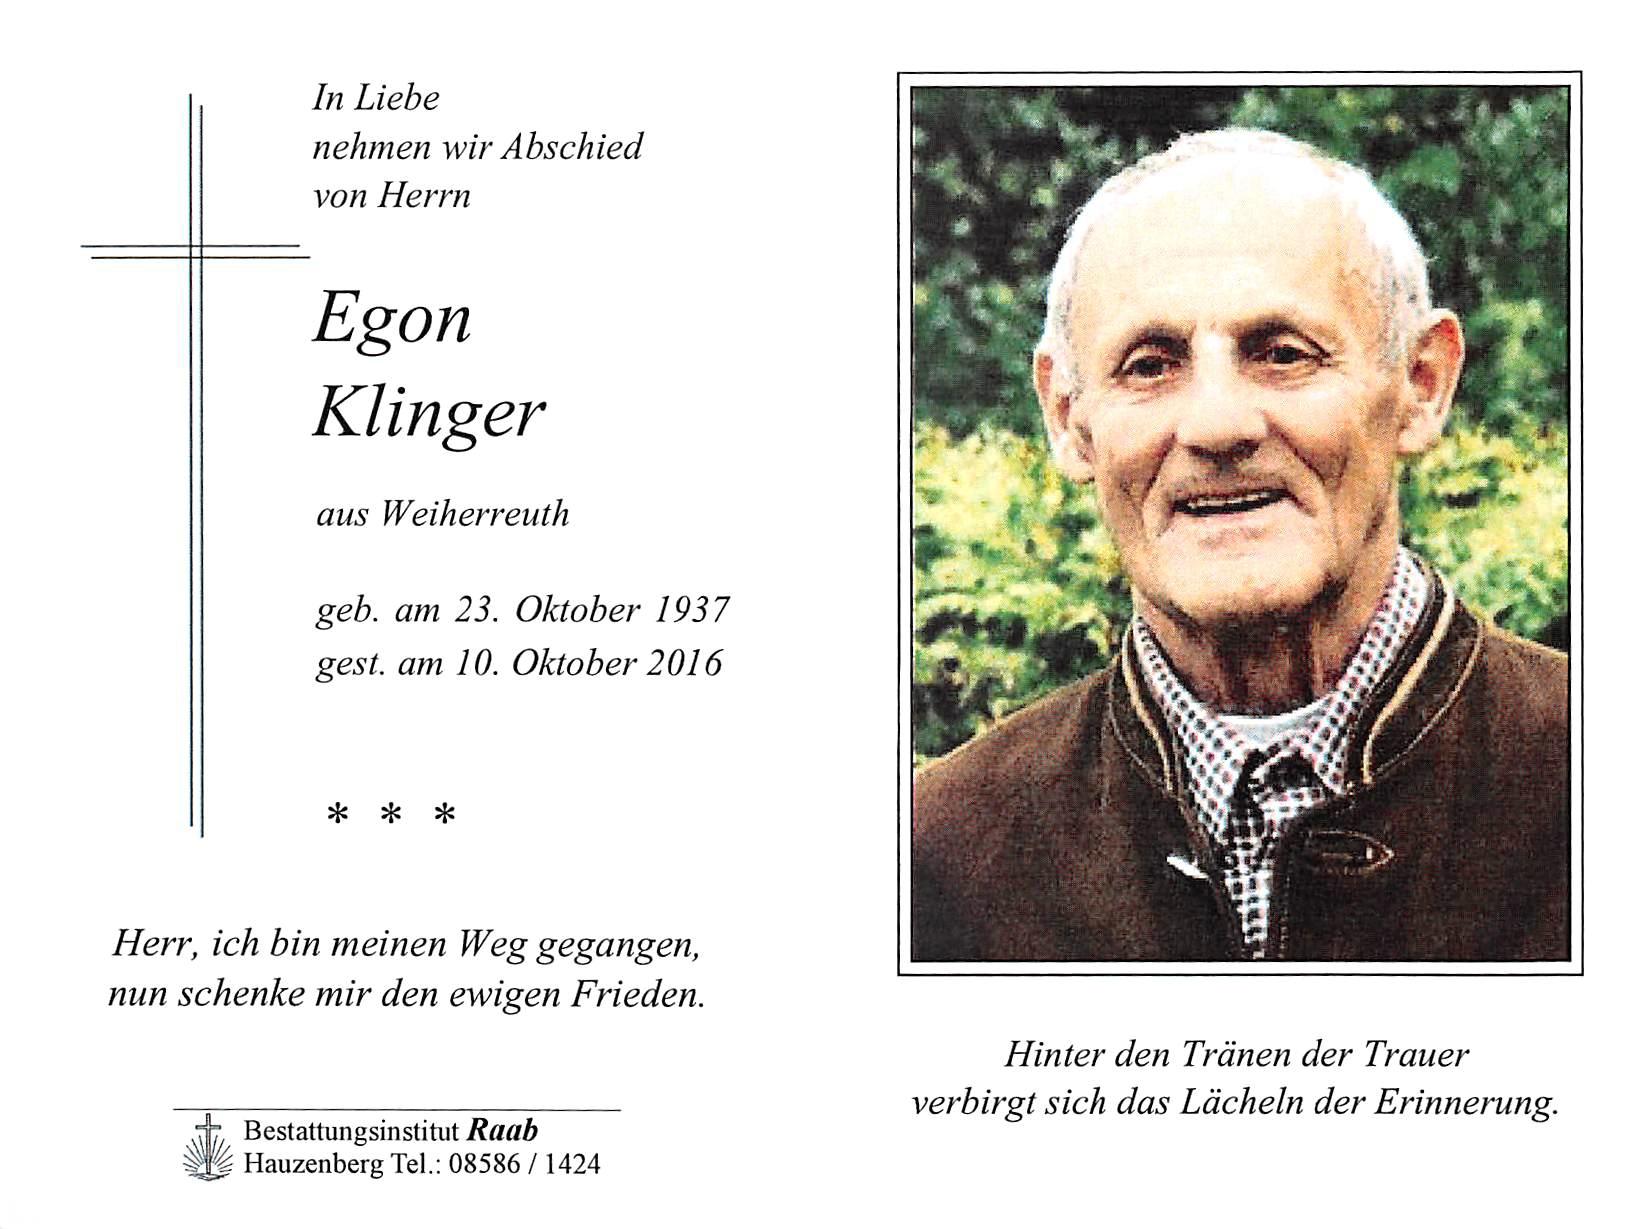 2016-10-10-Klinger-Egon-Weiherreuth